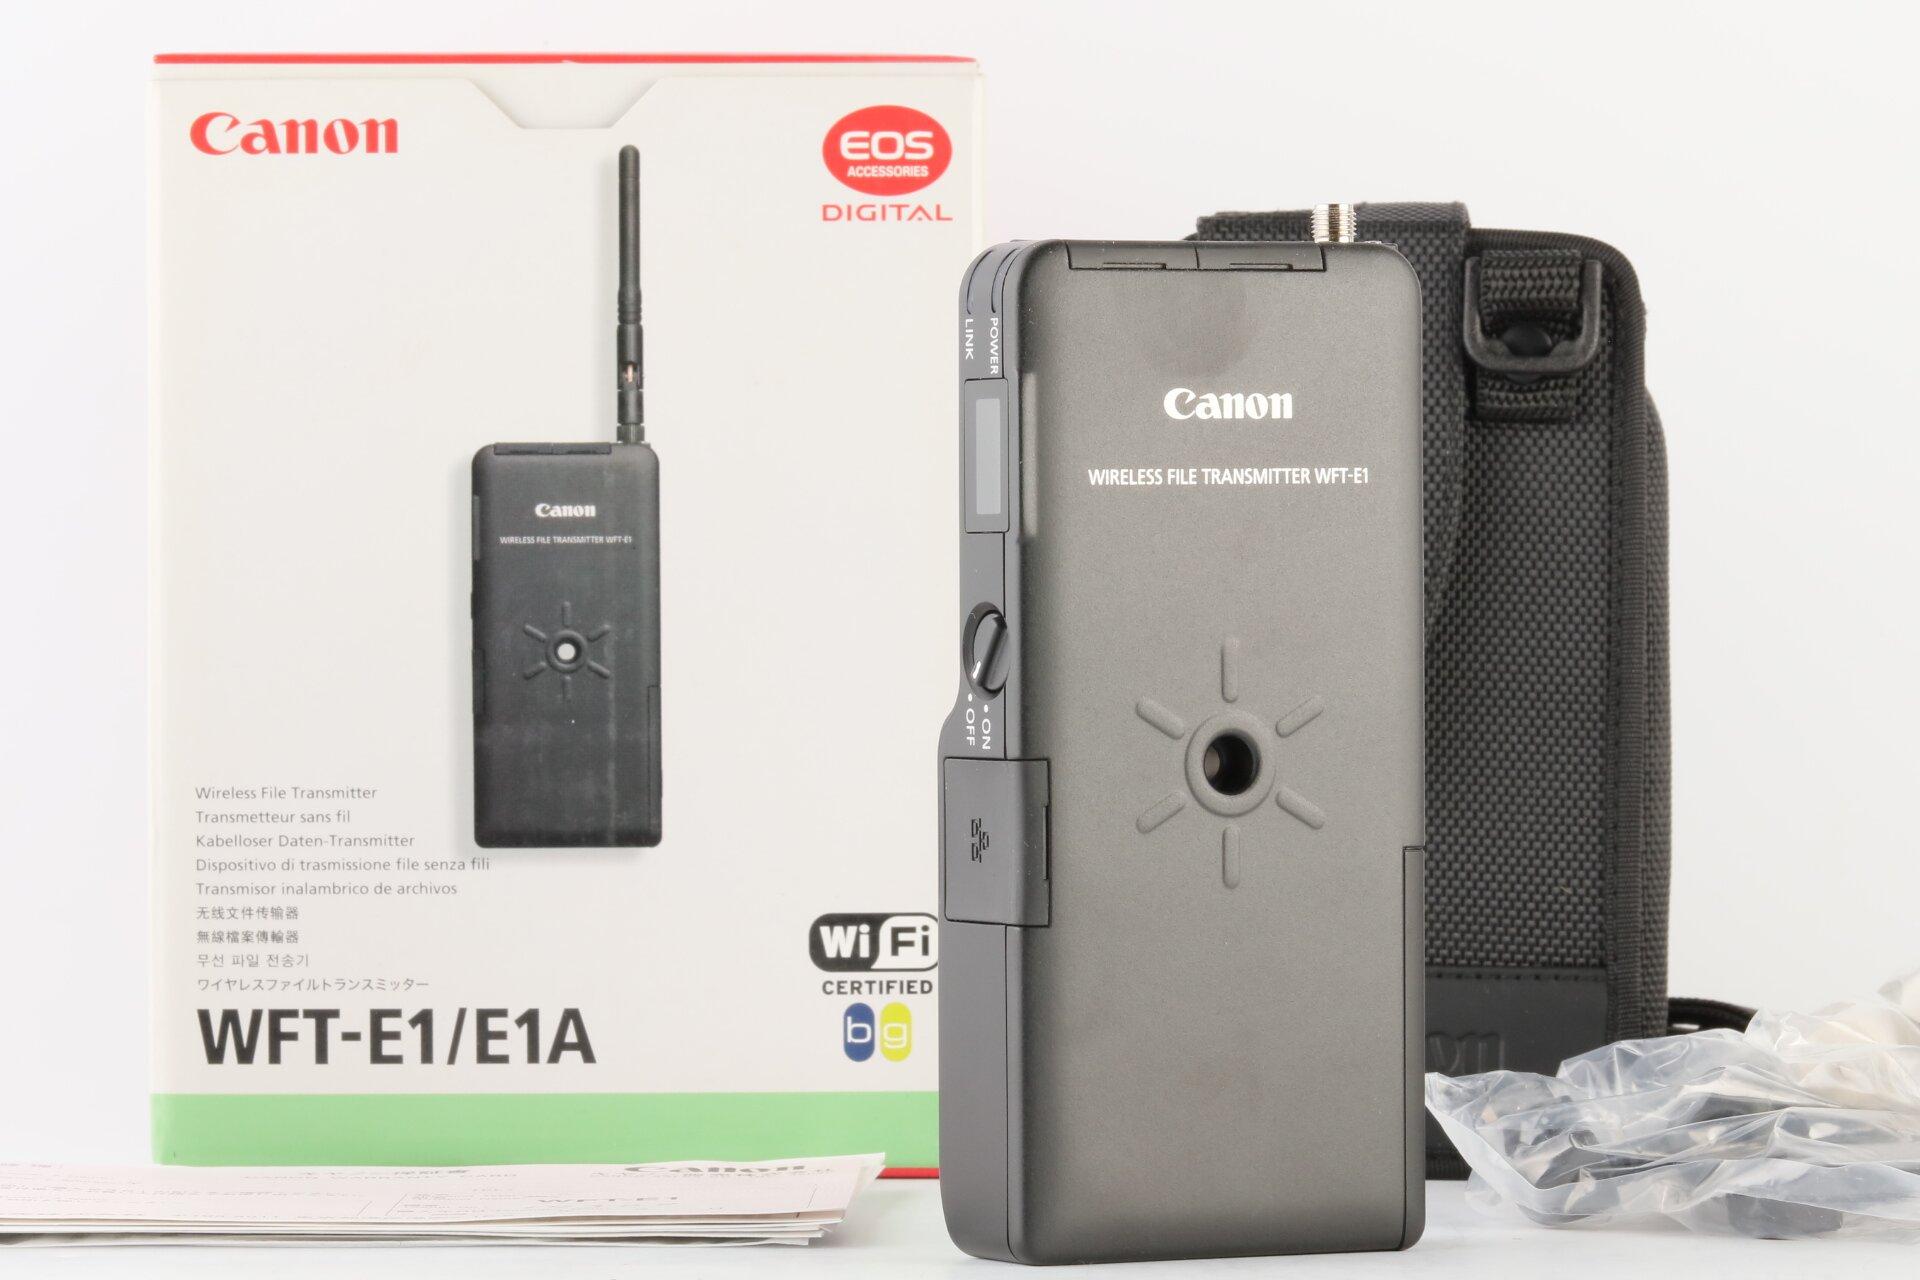 Canon Wireless File Transmitter WFT-E1/E1A